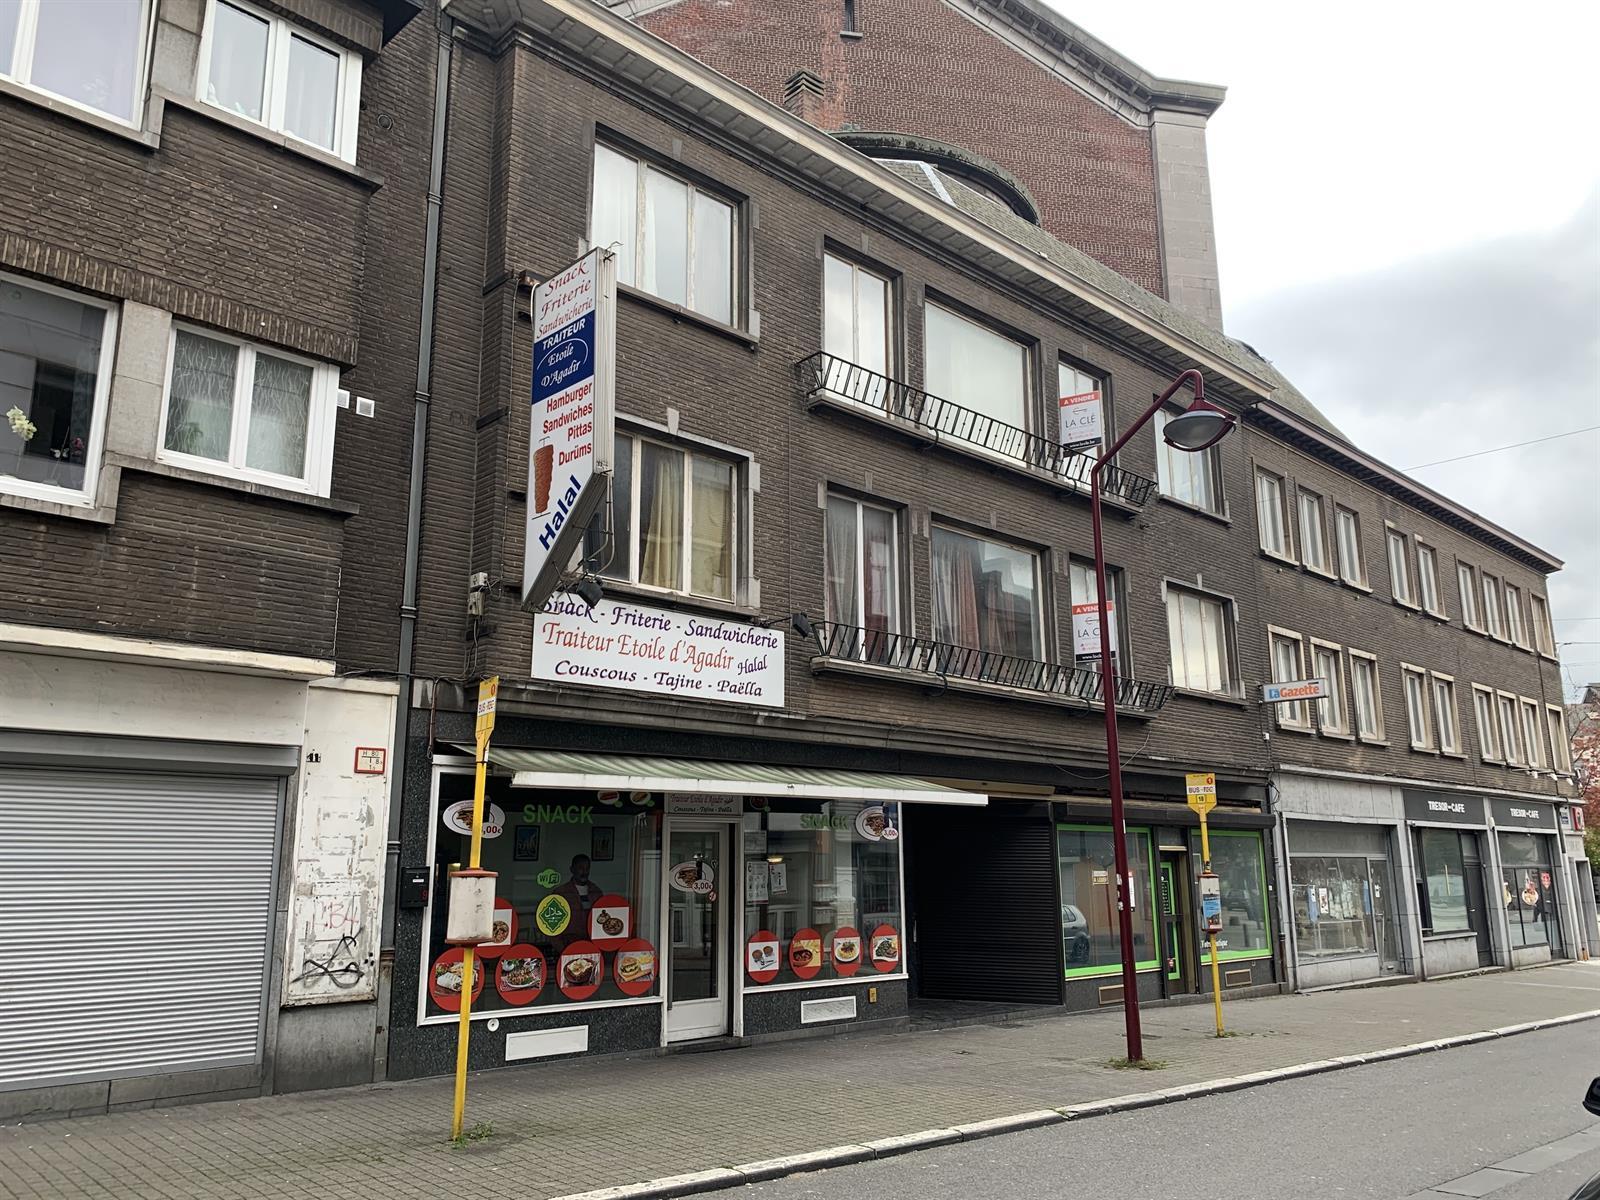 Immeuble à usage multiple - Charleroi - #4292206-0